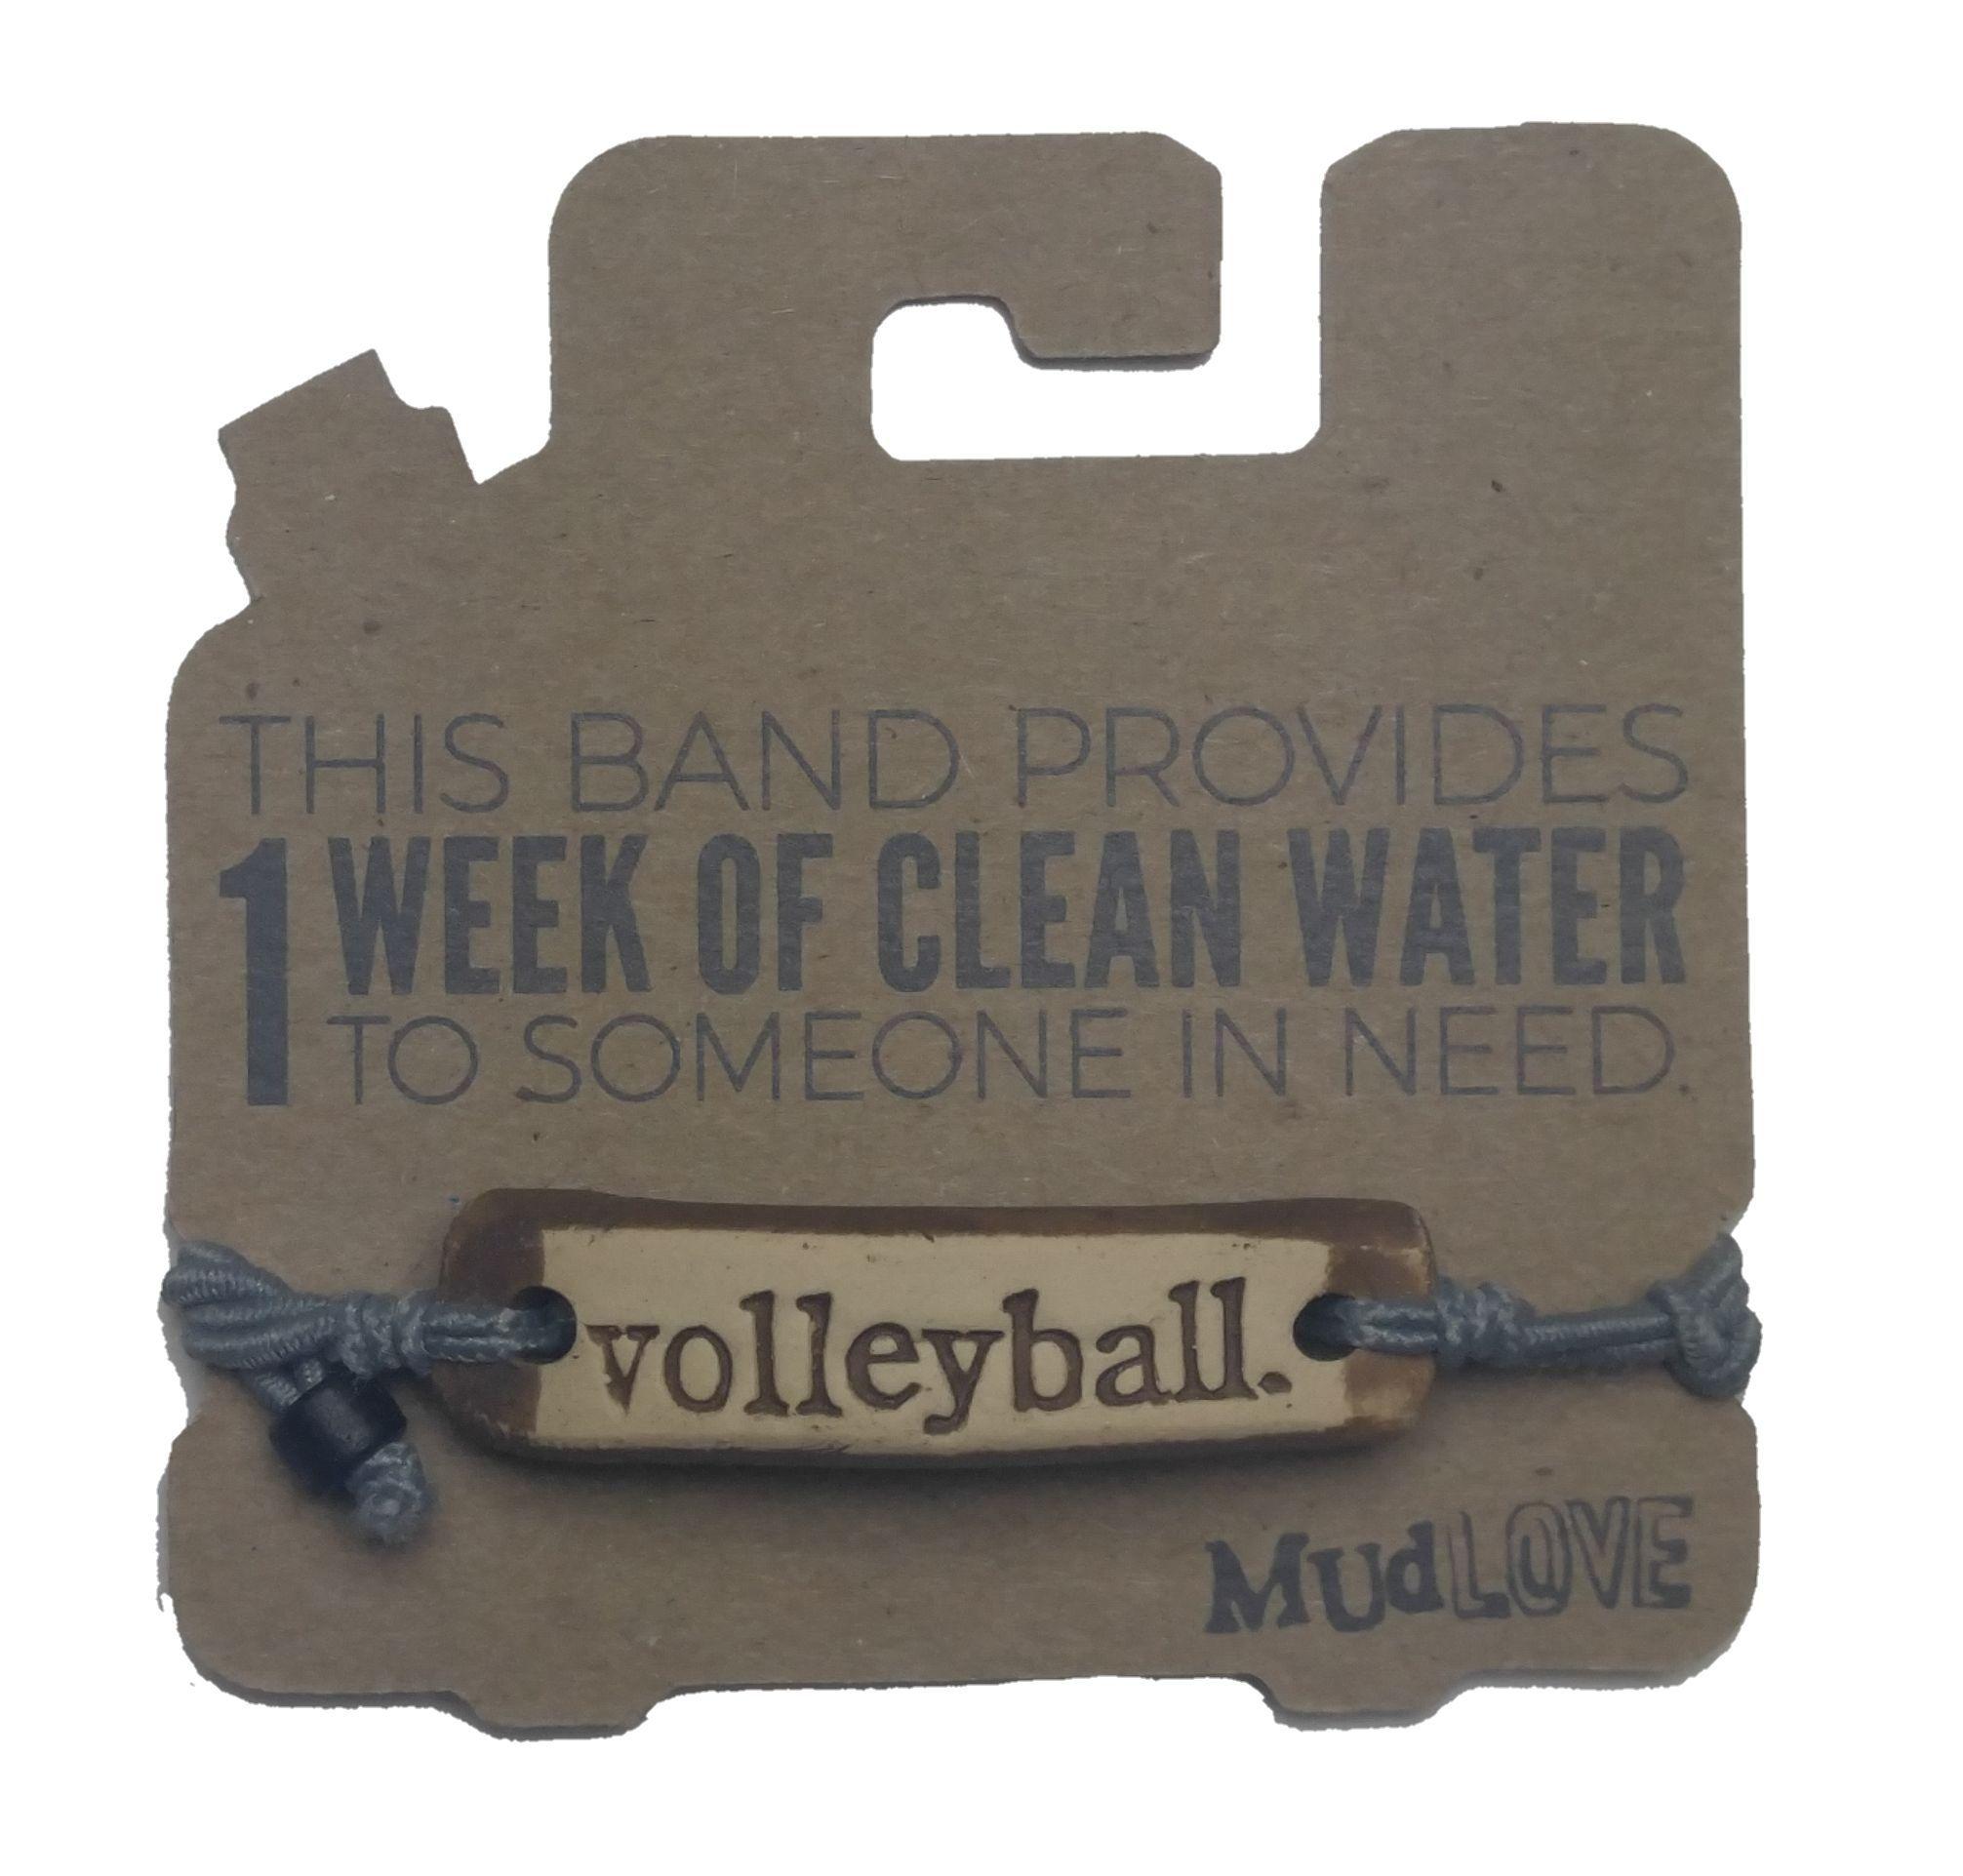 Mud Love Volleyball Bracelet Lucky Dog Volleyball Volleyball Jewelry Volleyball Volleyball Gifts